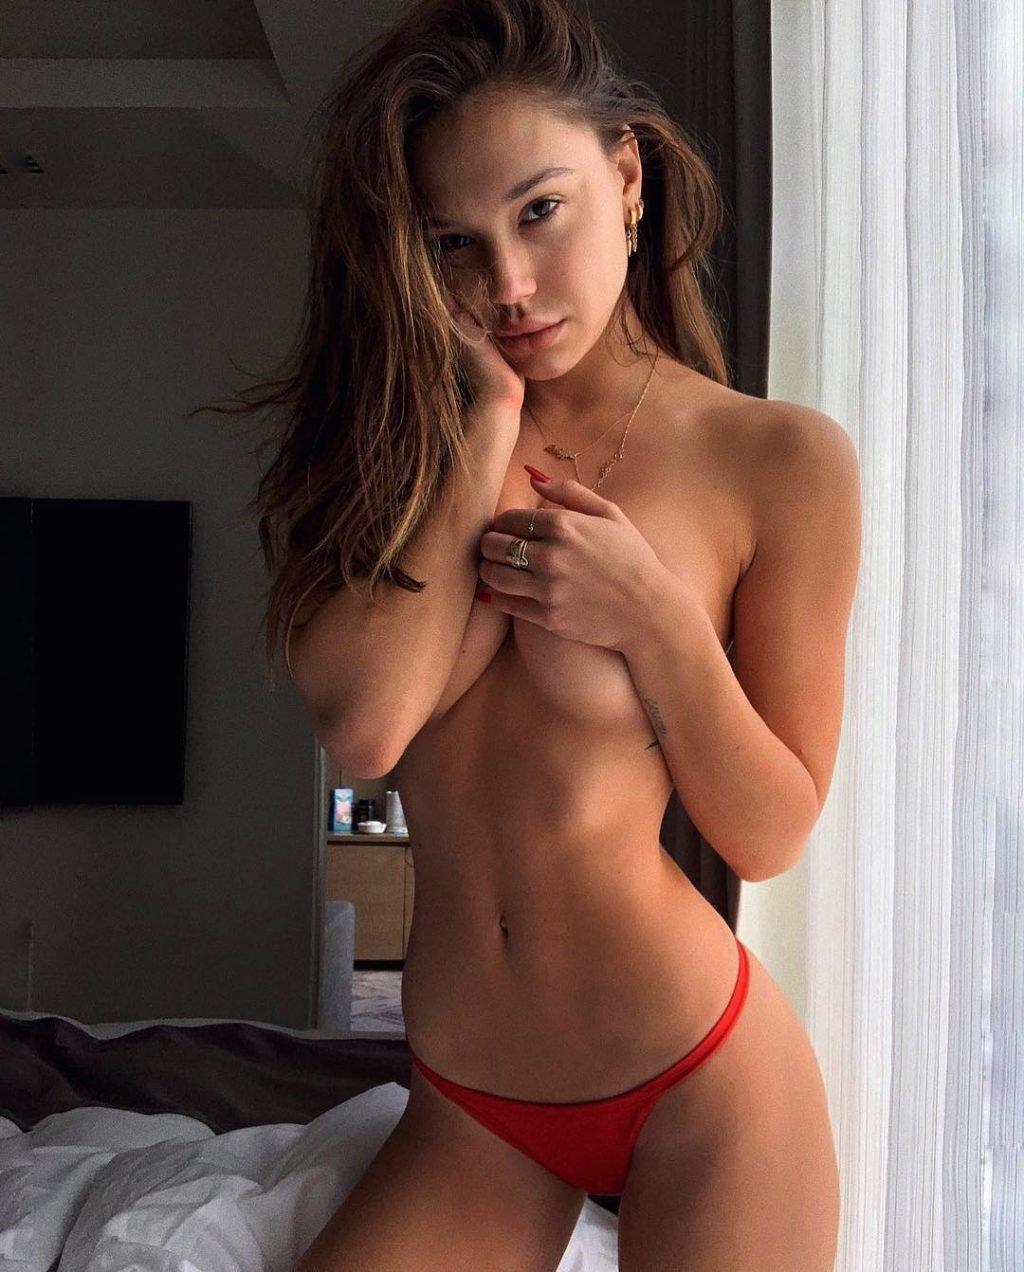 Alexis Ren Topless (2 Hot Photos)